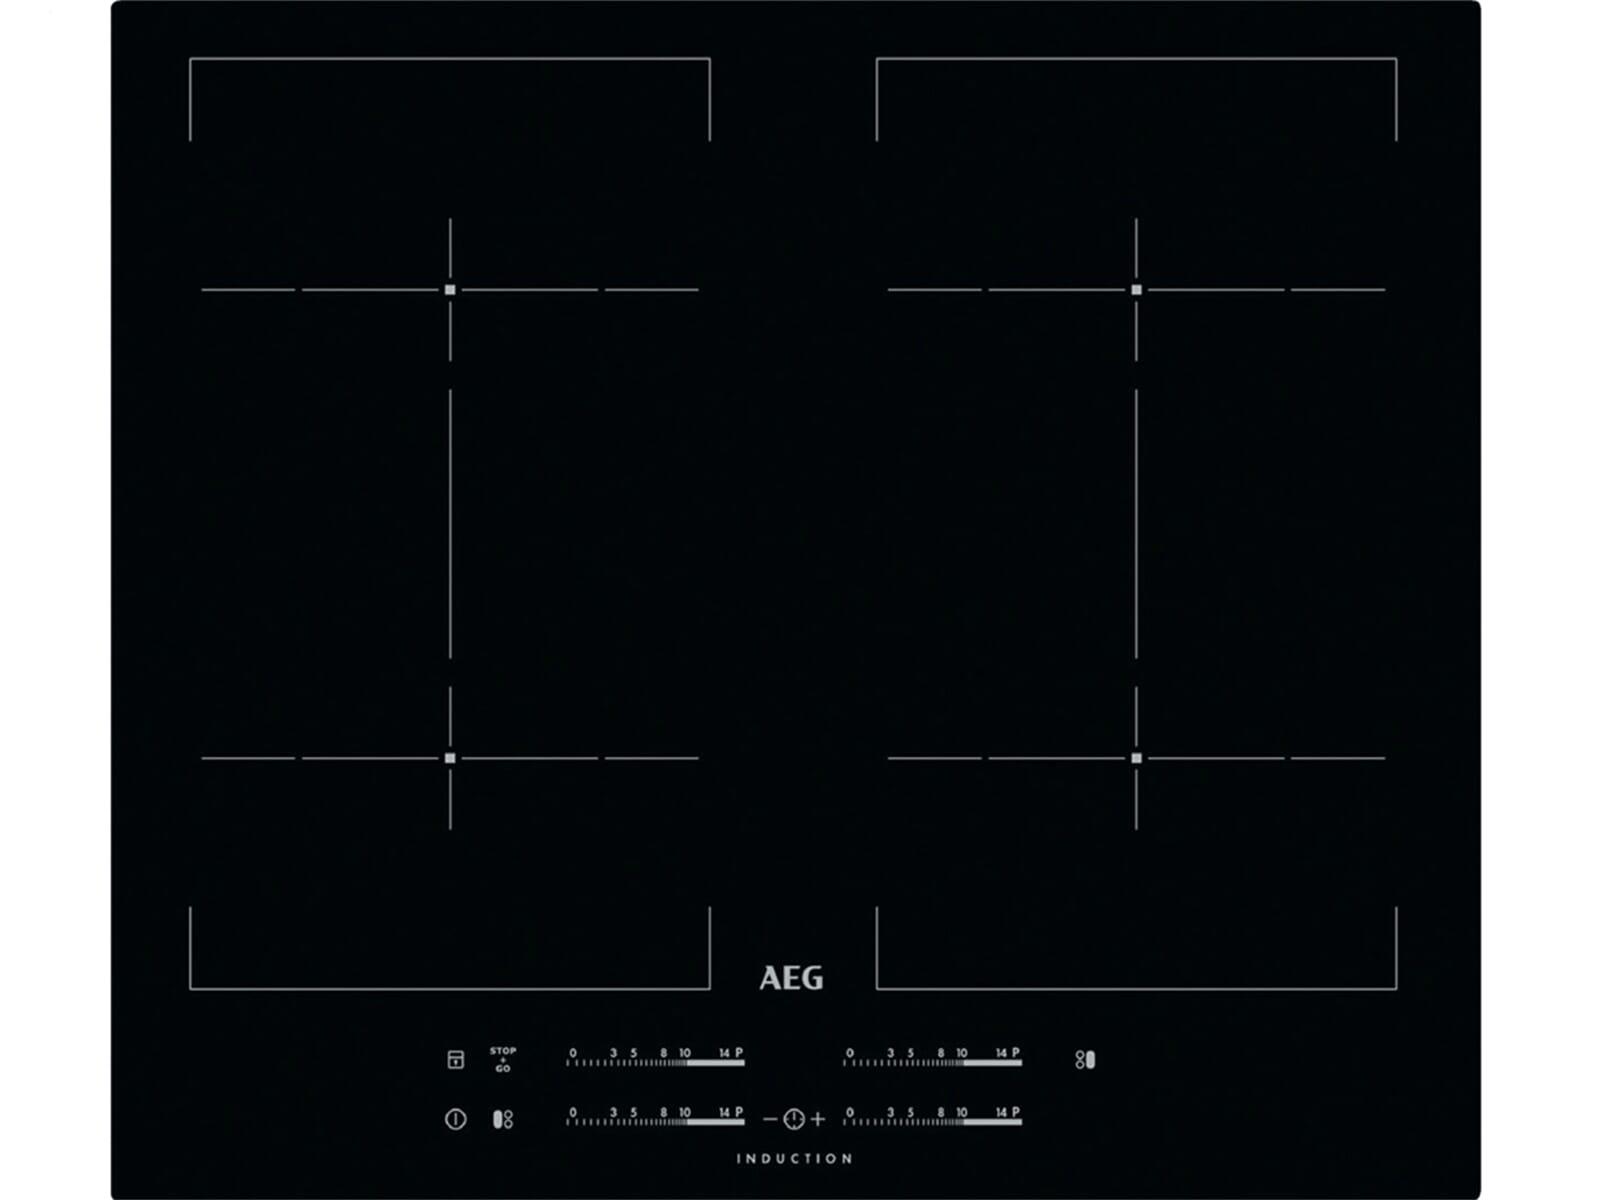 aeg hkm65400i b induktionskochfeld autark. Black Bedroom Furniture Sets. Home Design Ideas